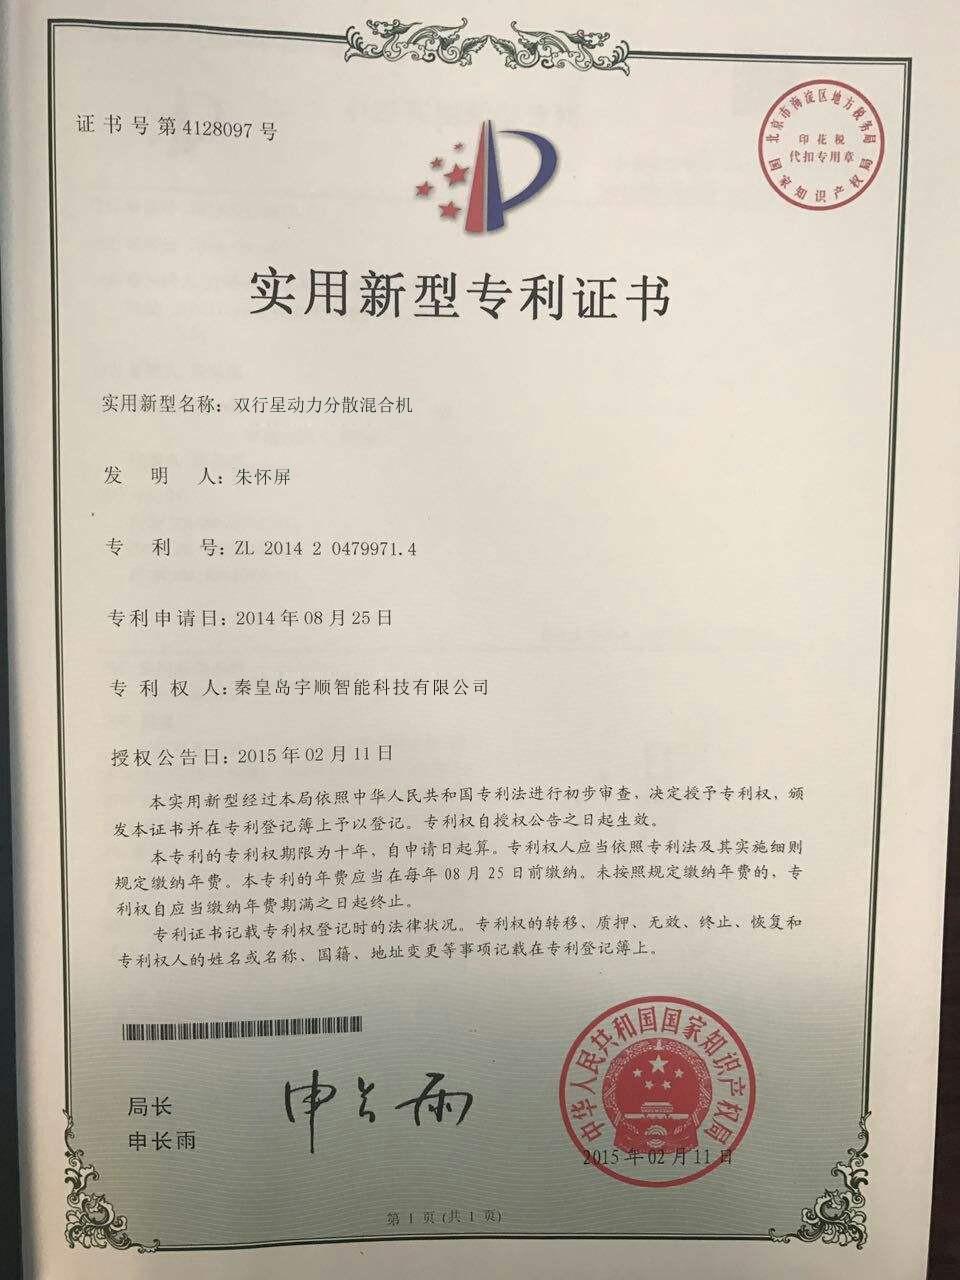 Utility model patents